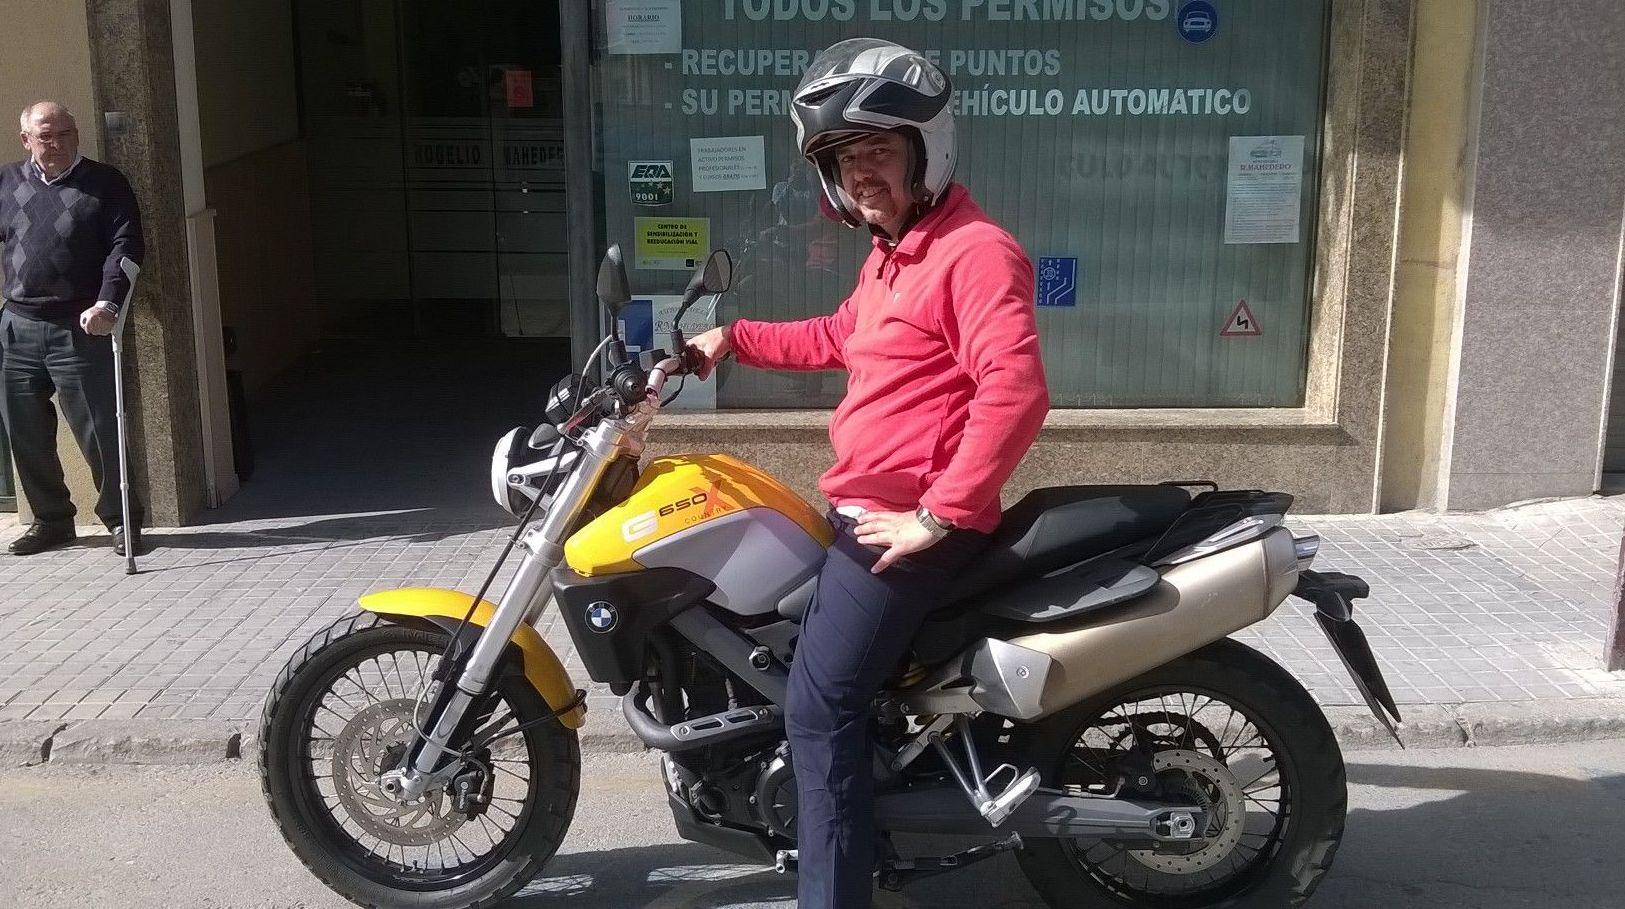 MOTO PERMISO A2